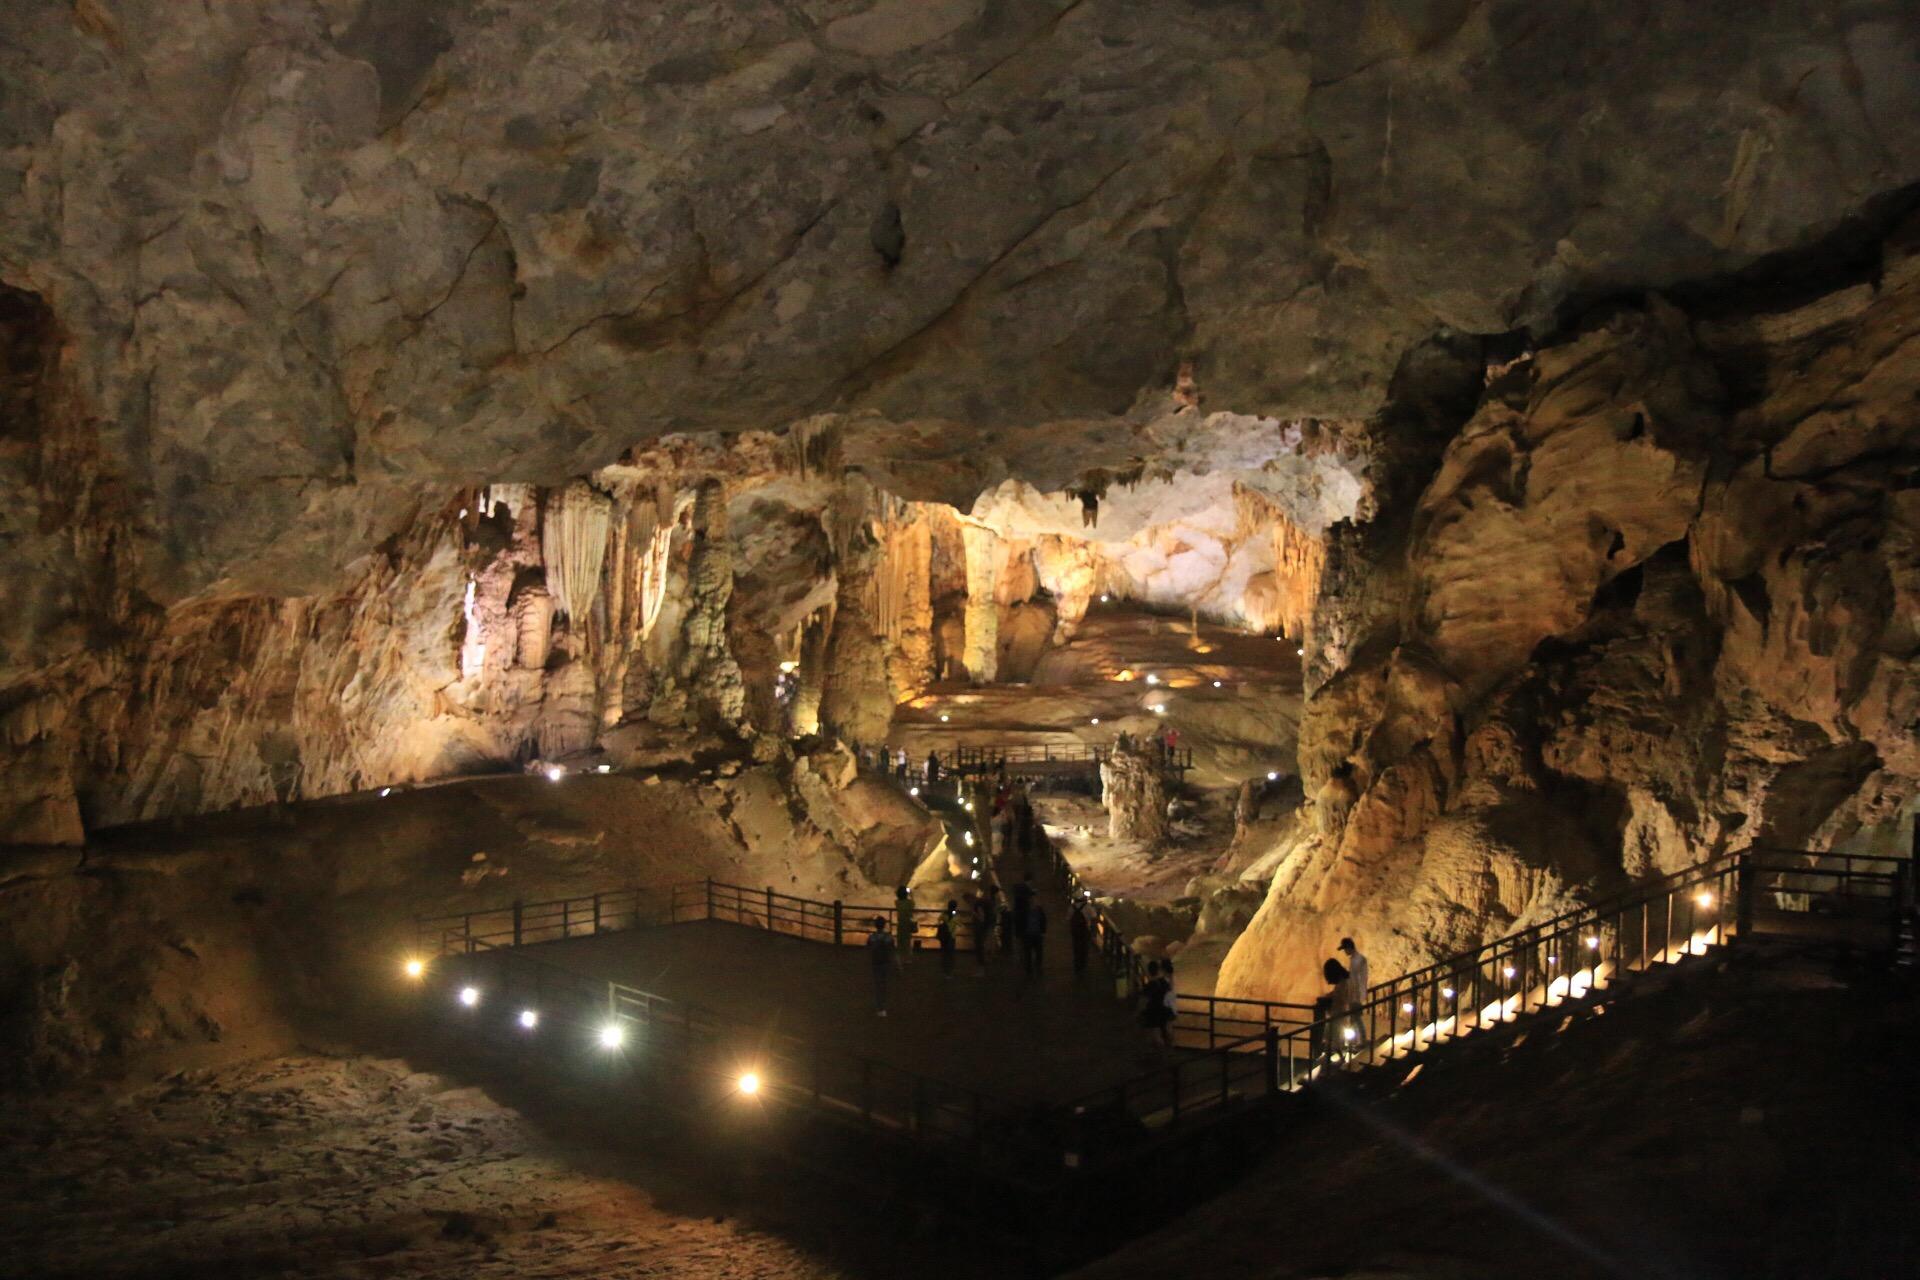 Der Anblick in die große Halle der Paradieshöhle war atemberaubend!